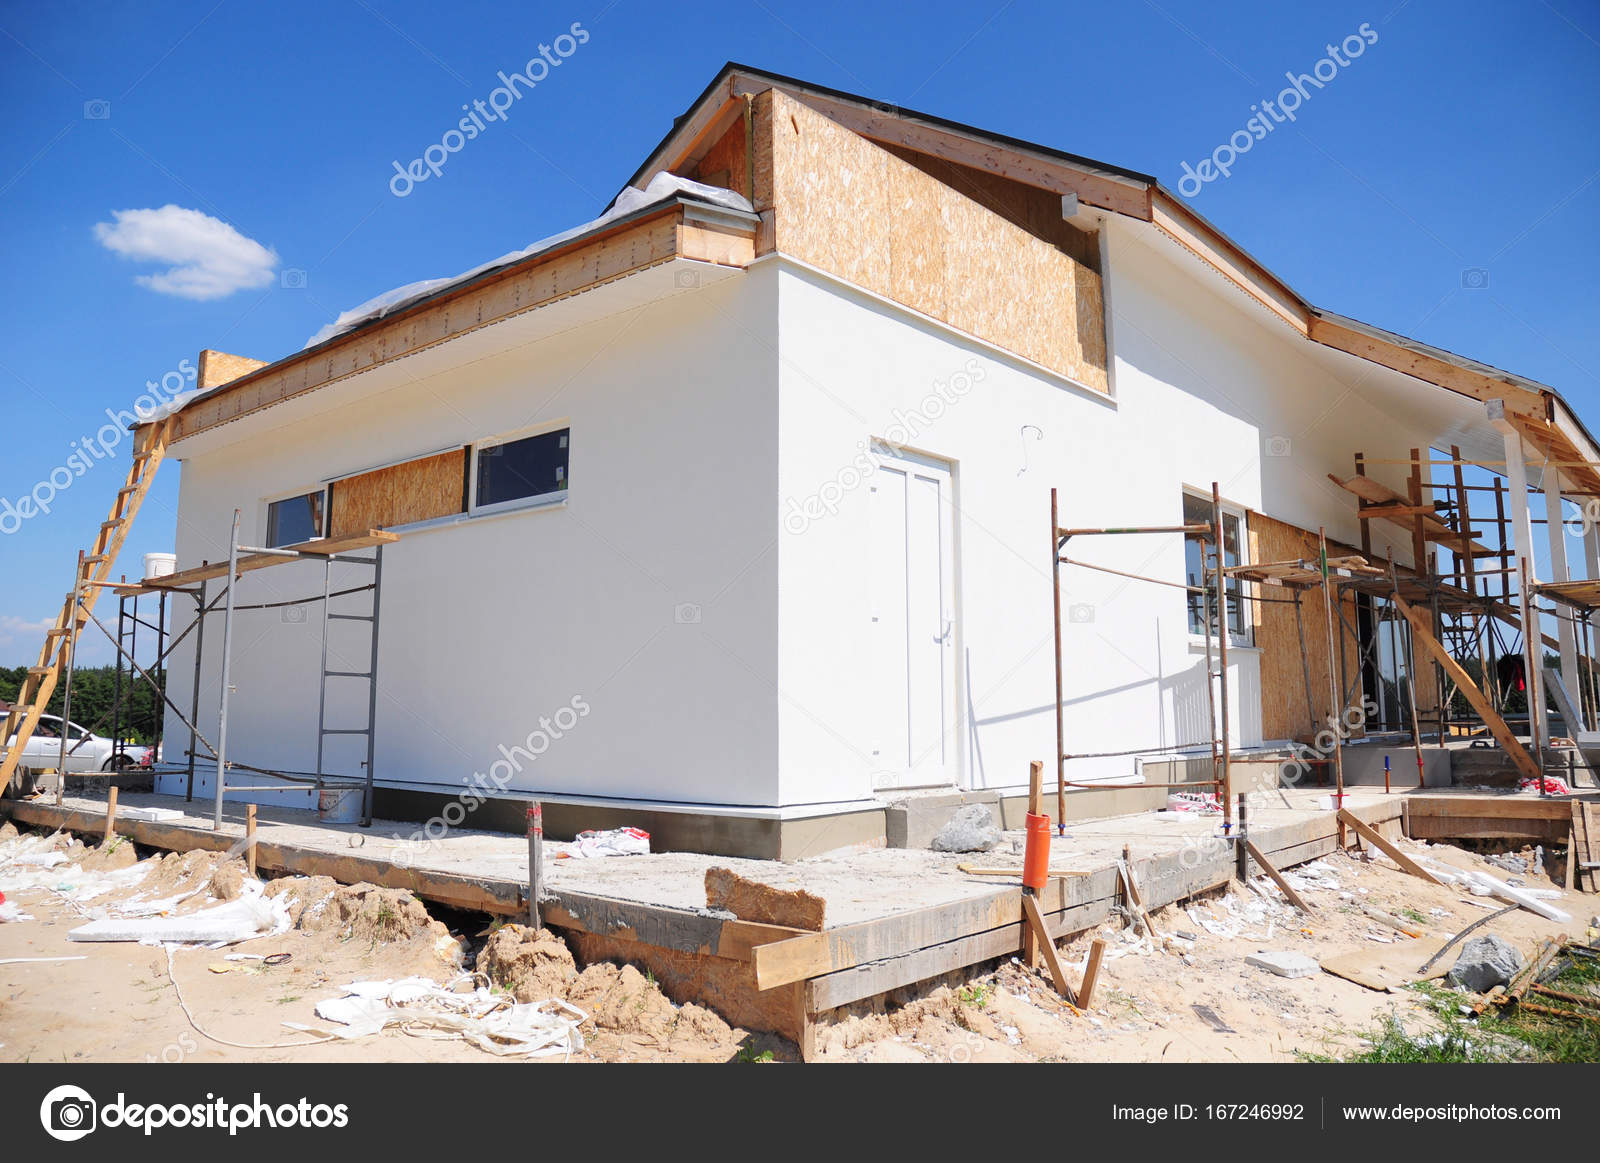 Onvoltooide huis huis verbouwing en renovatie huis wal met